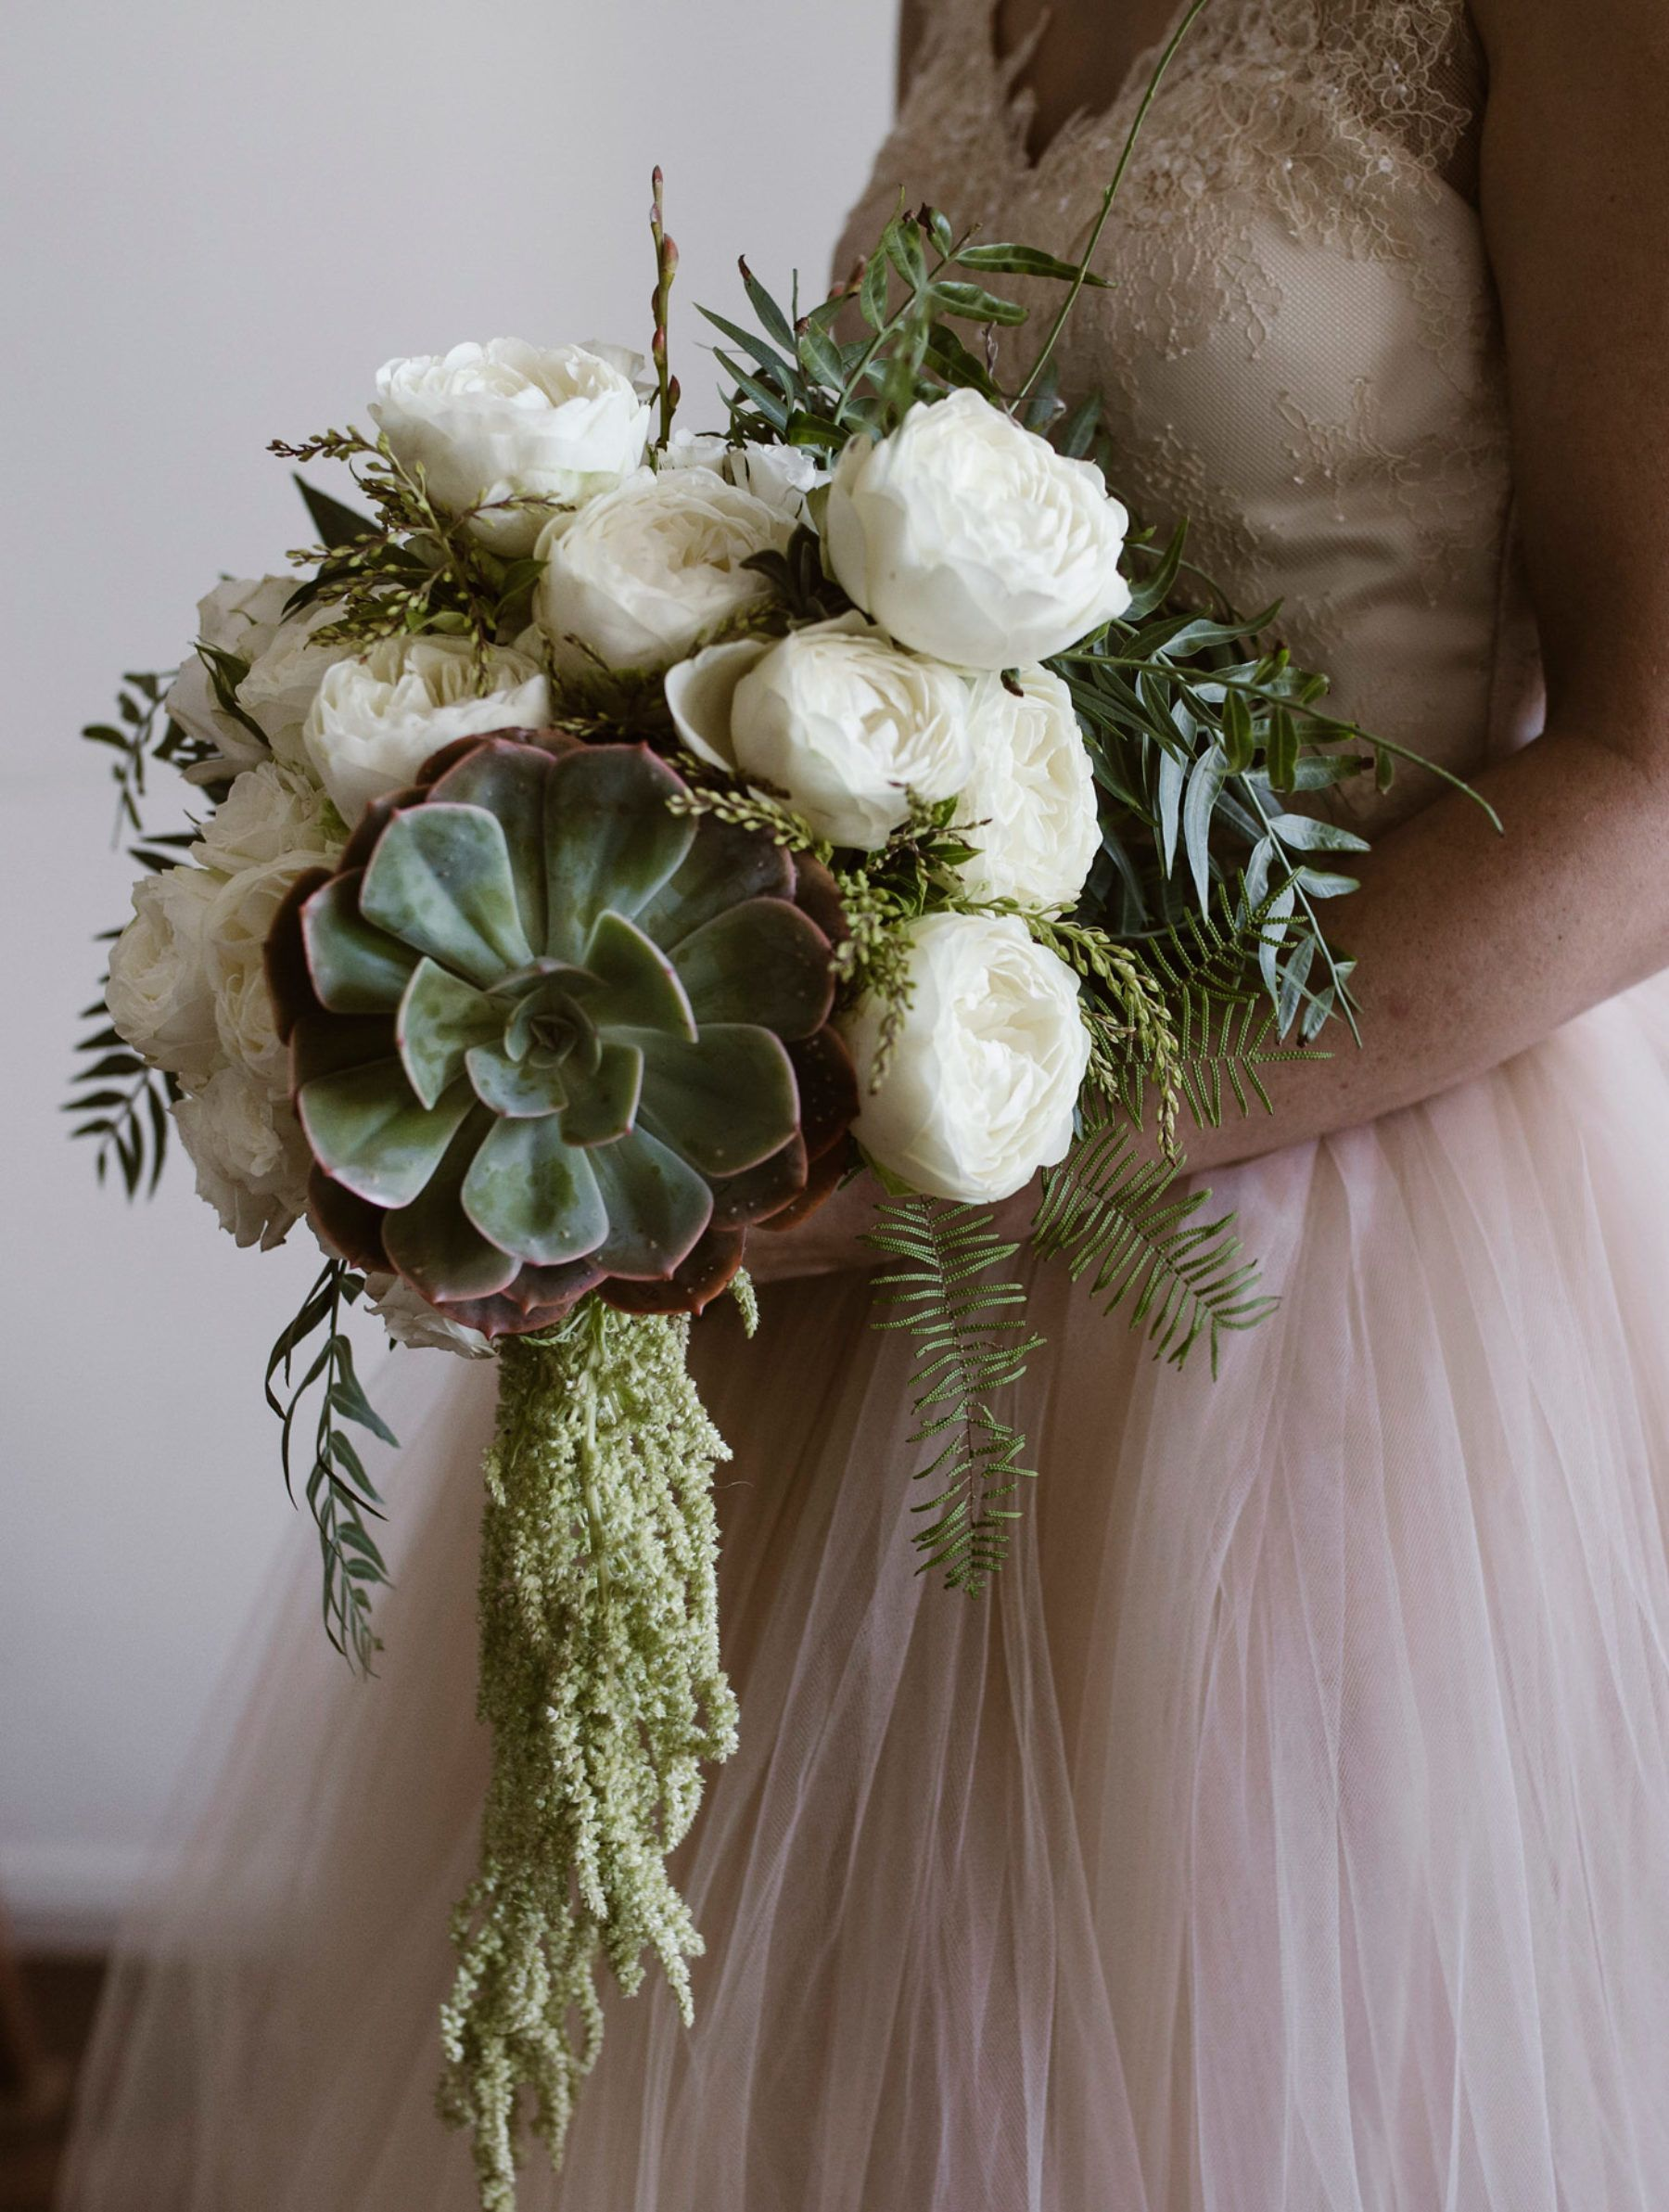 Jacqui Adam S Japanese Inspired Wedding At Perth City Farm Nouba Com Au Modern Wedding Theme Wedding Bouquets Bride Fall Wedding Bouquets